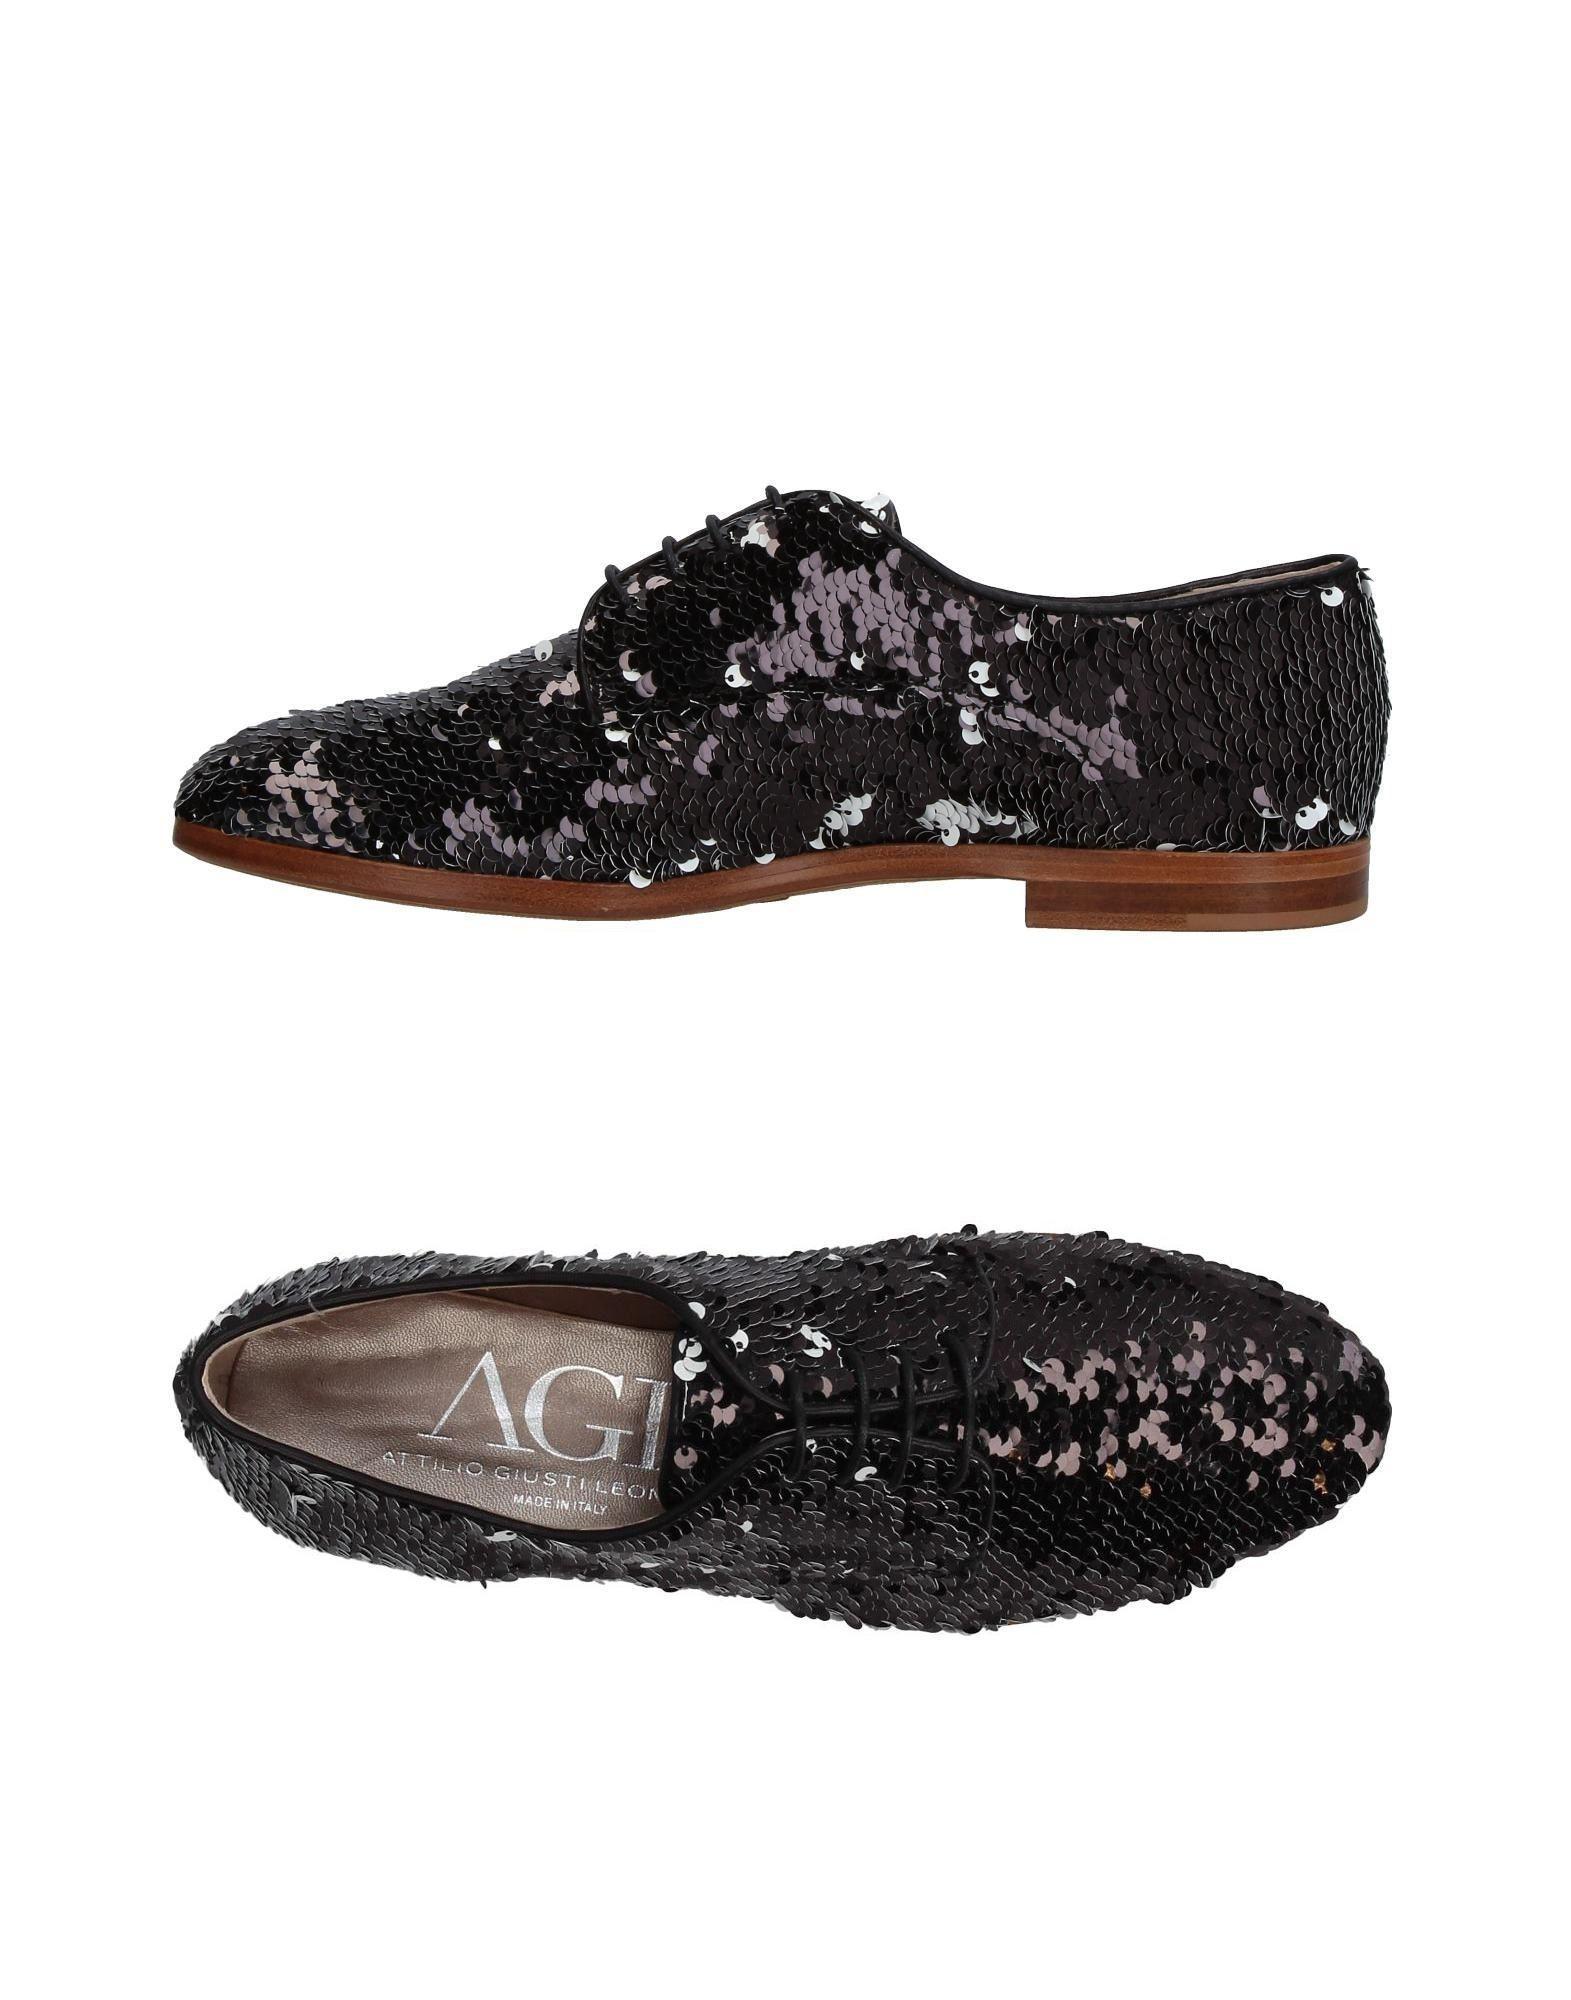 AGL ATTILIO GIUSTI LEOMBRUNI Flat lace up sneakers rNwU9s02